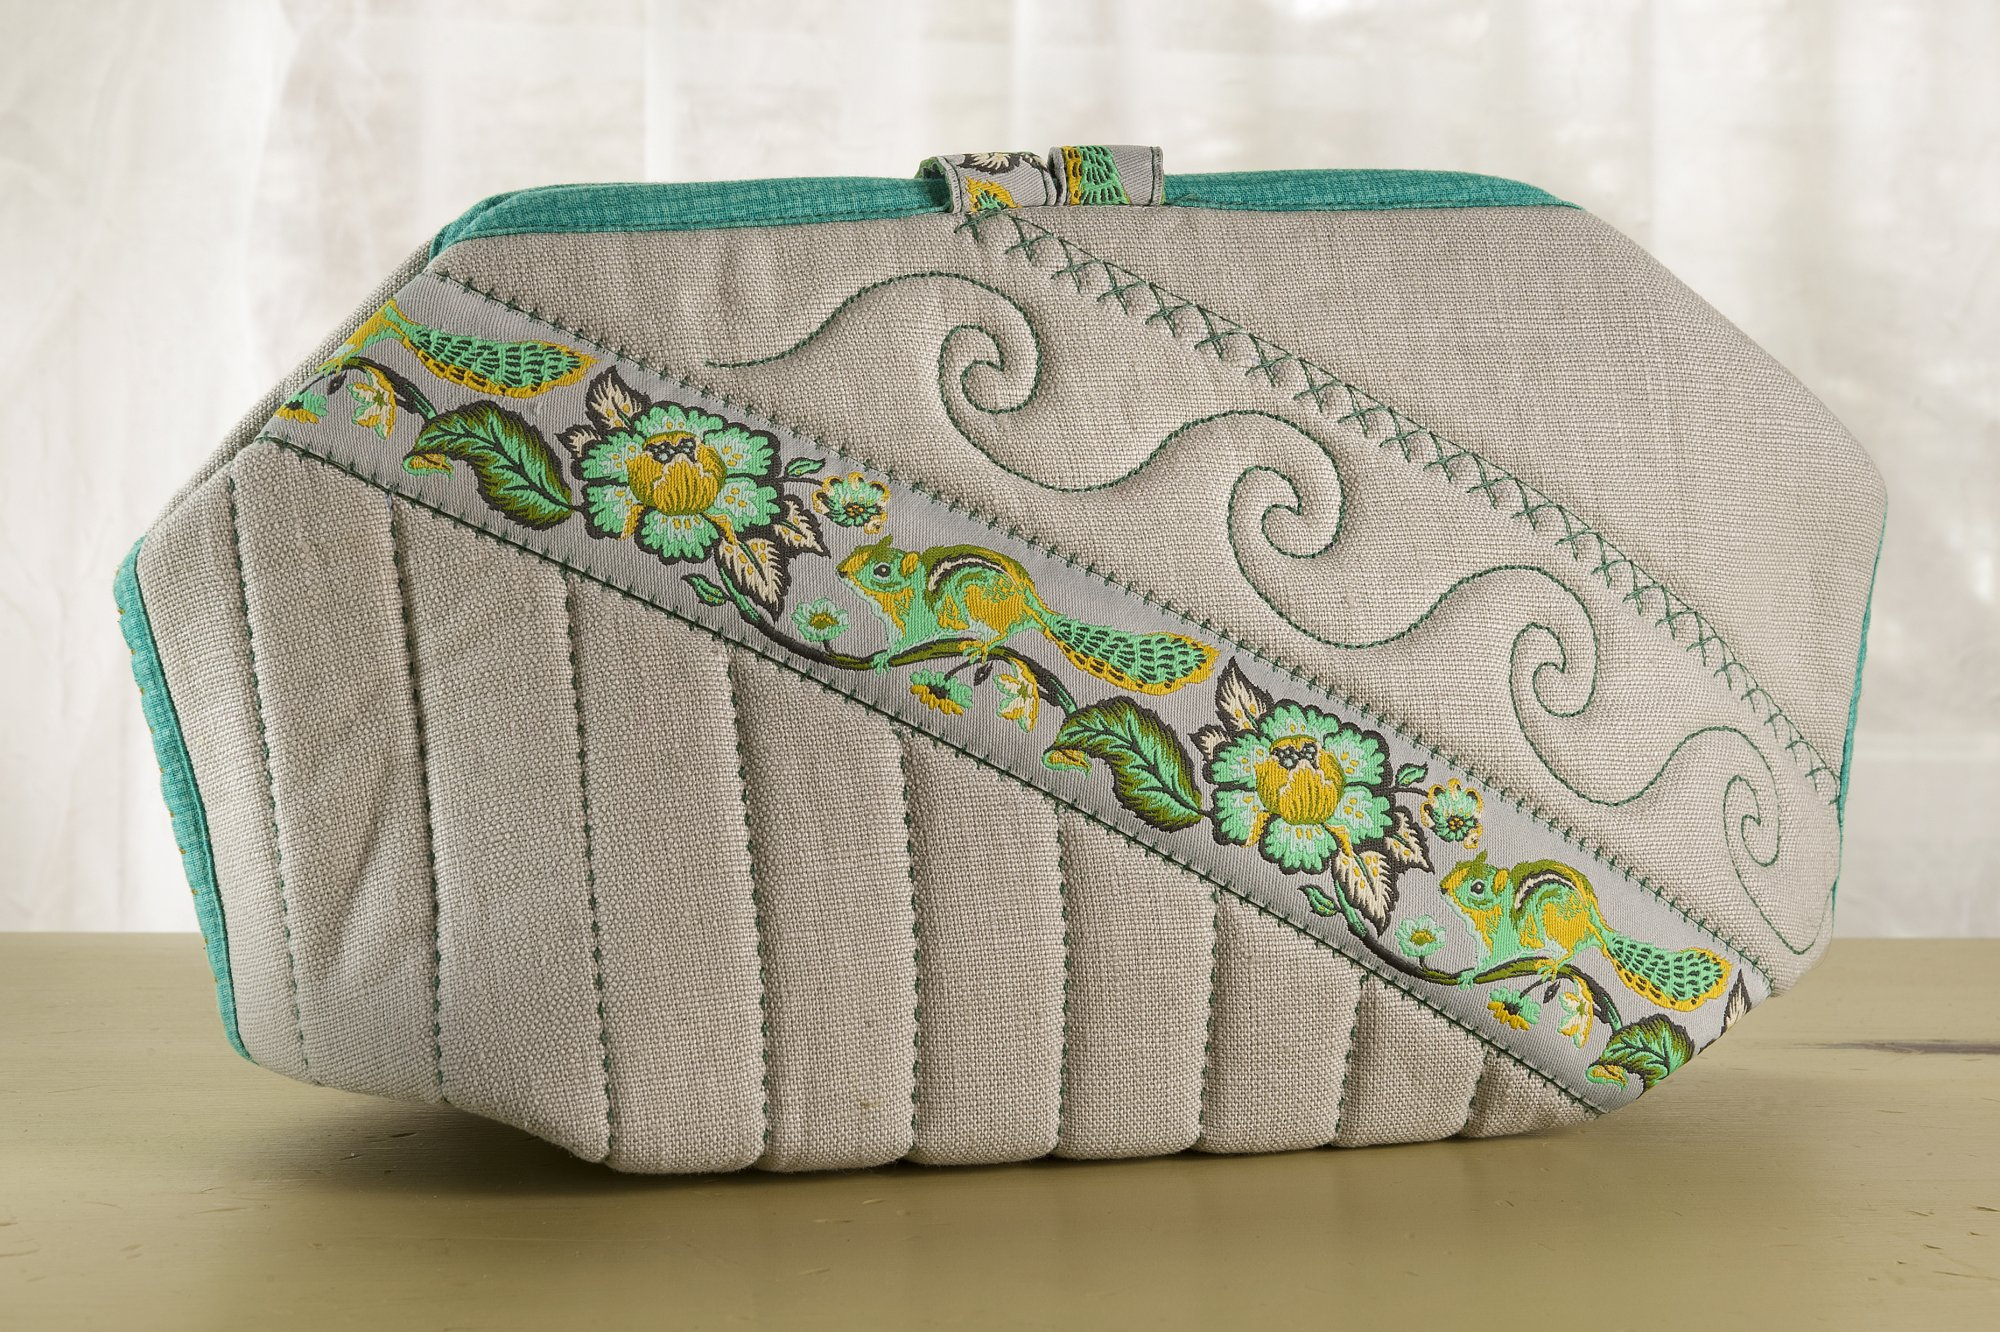 Sewapalooza Quilted Bag Kit